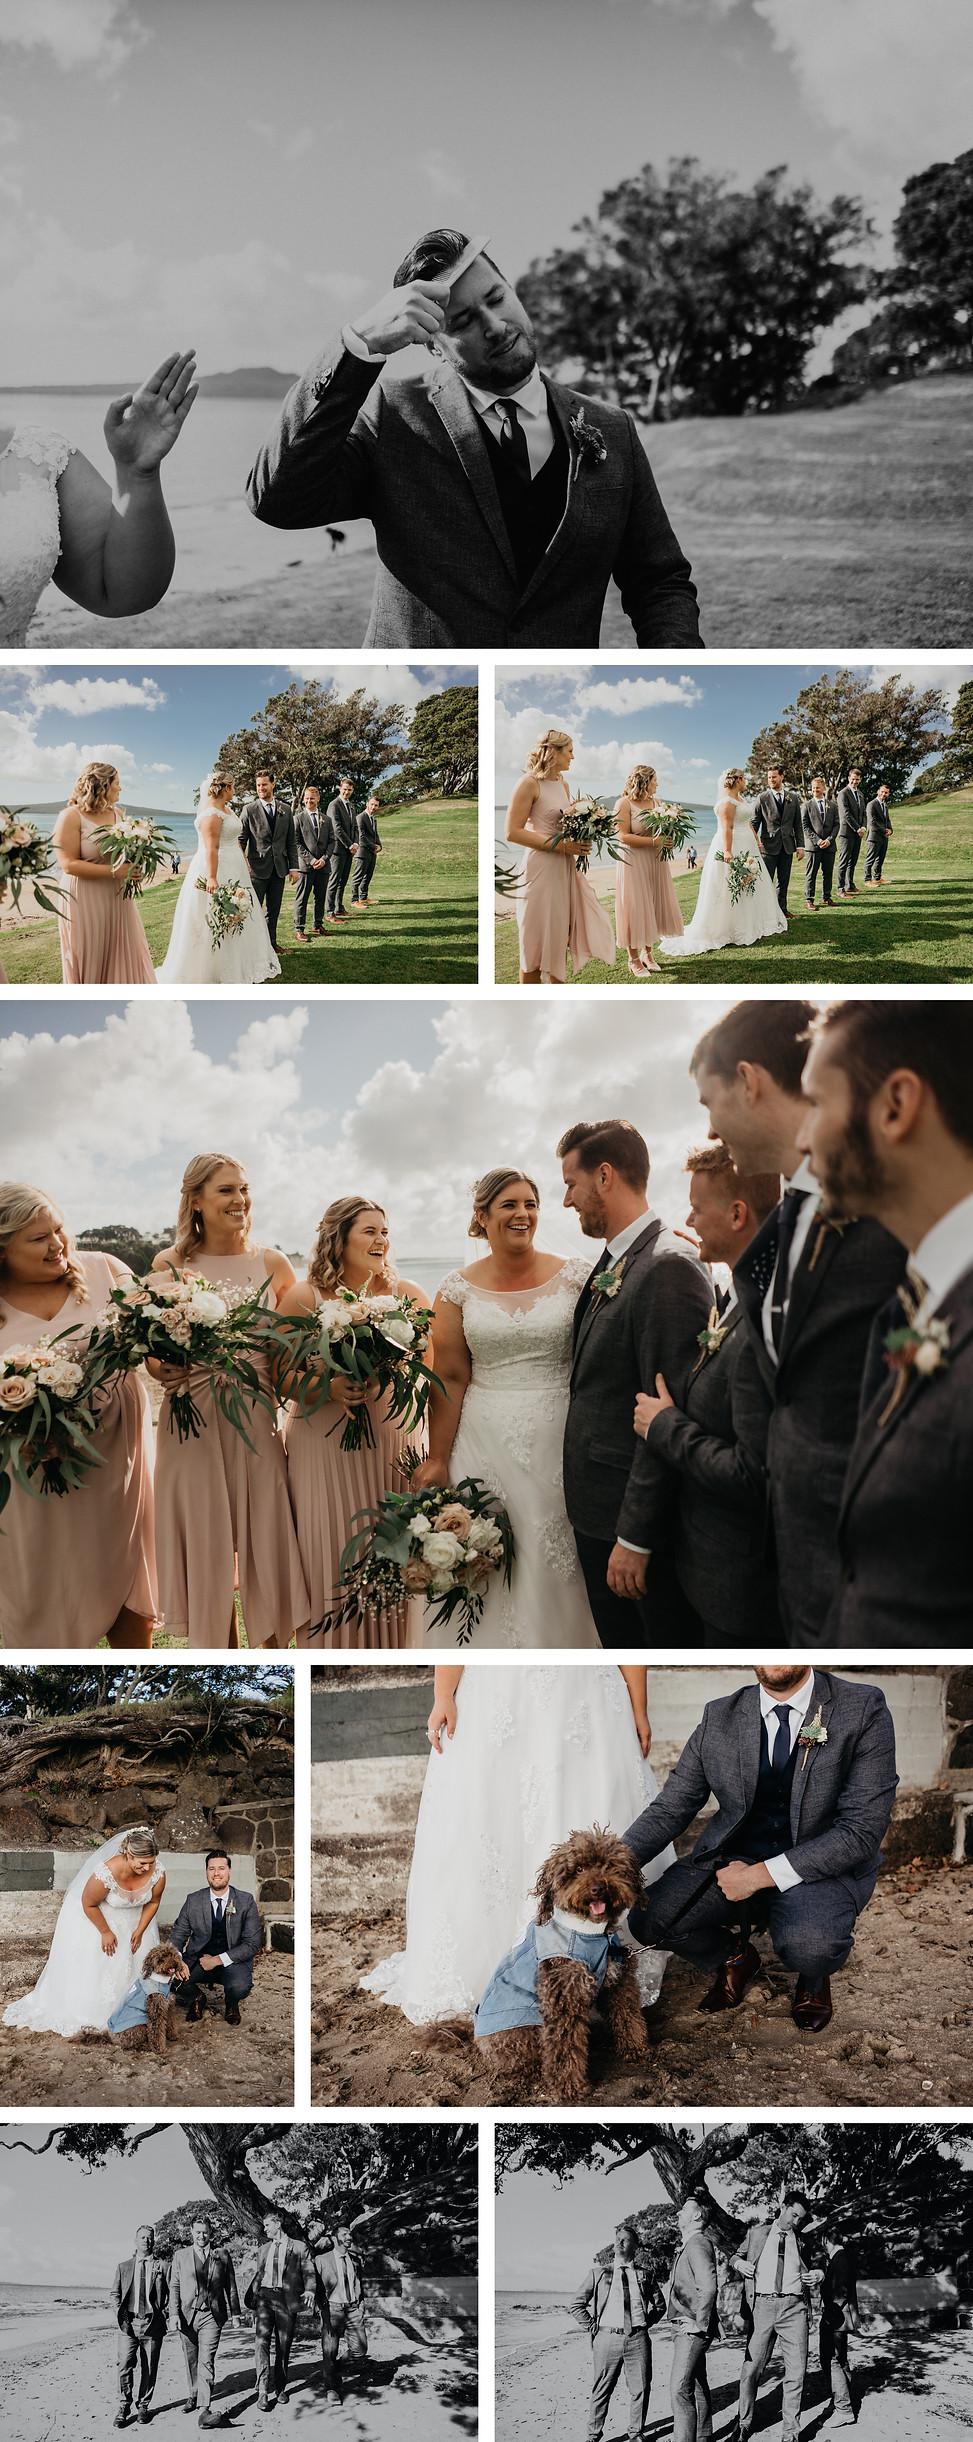 bridal group photos captured in narrow neck beach, groom, bride, dog bridal party photo